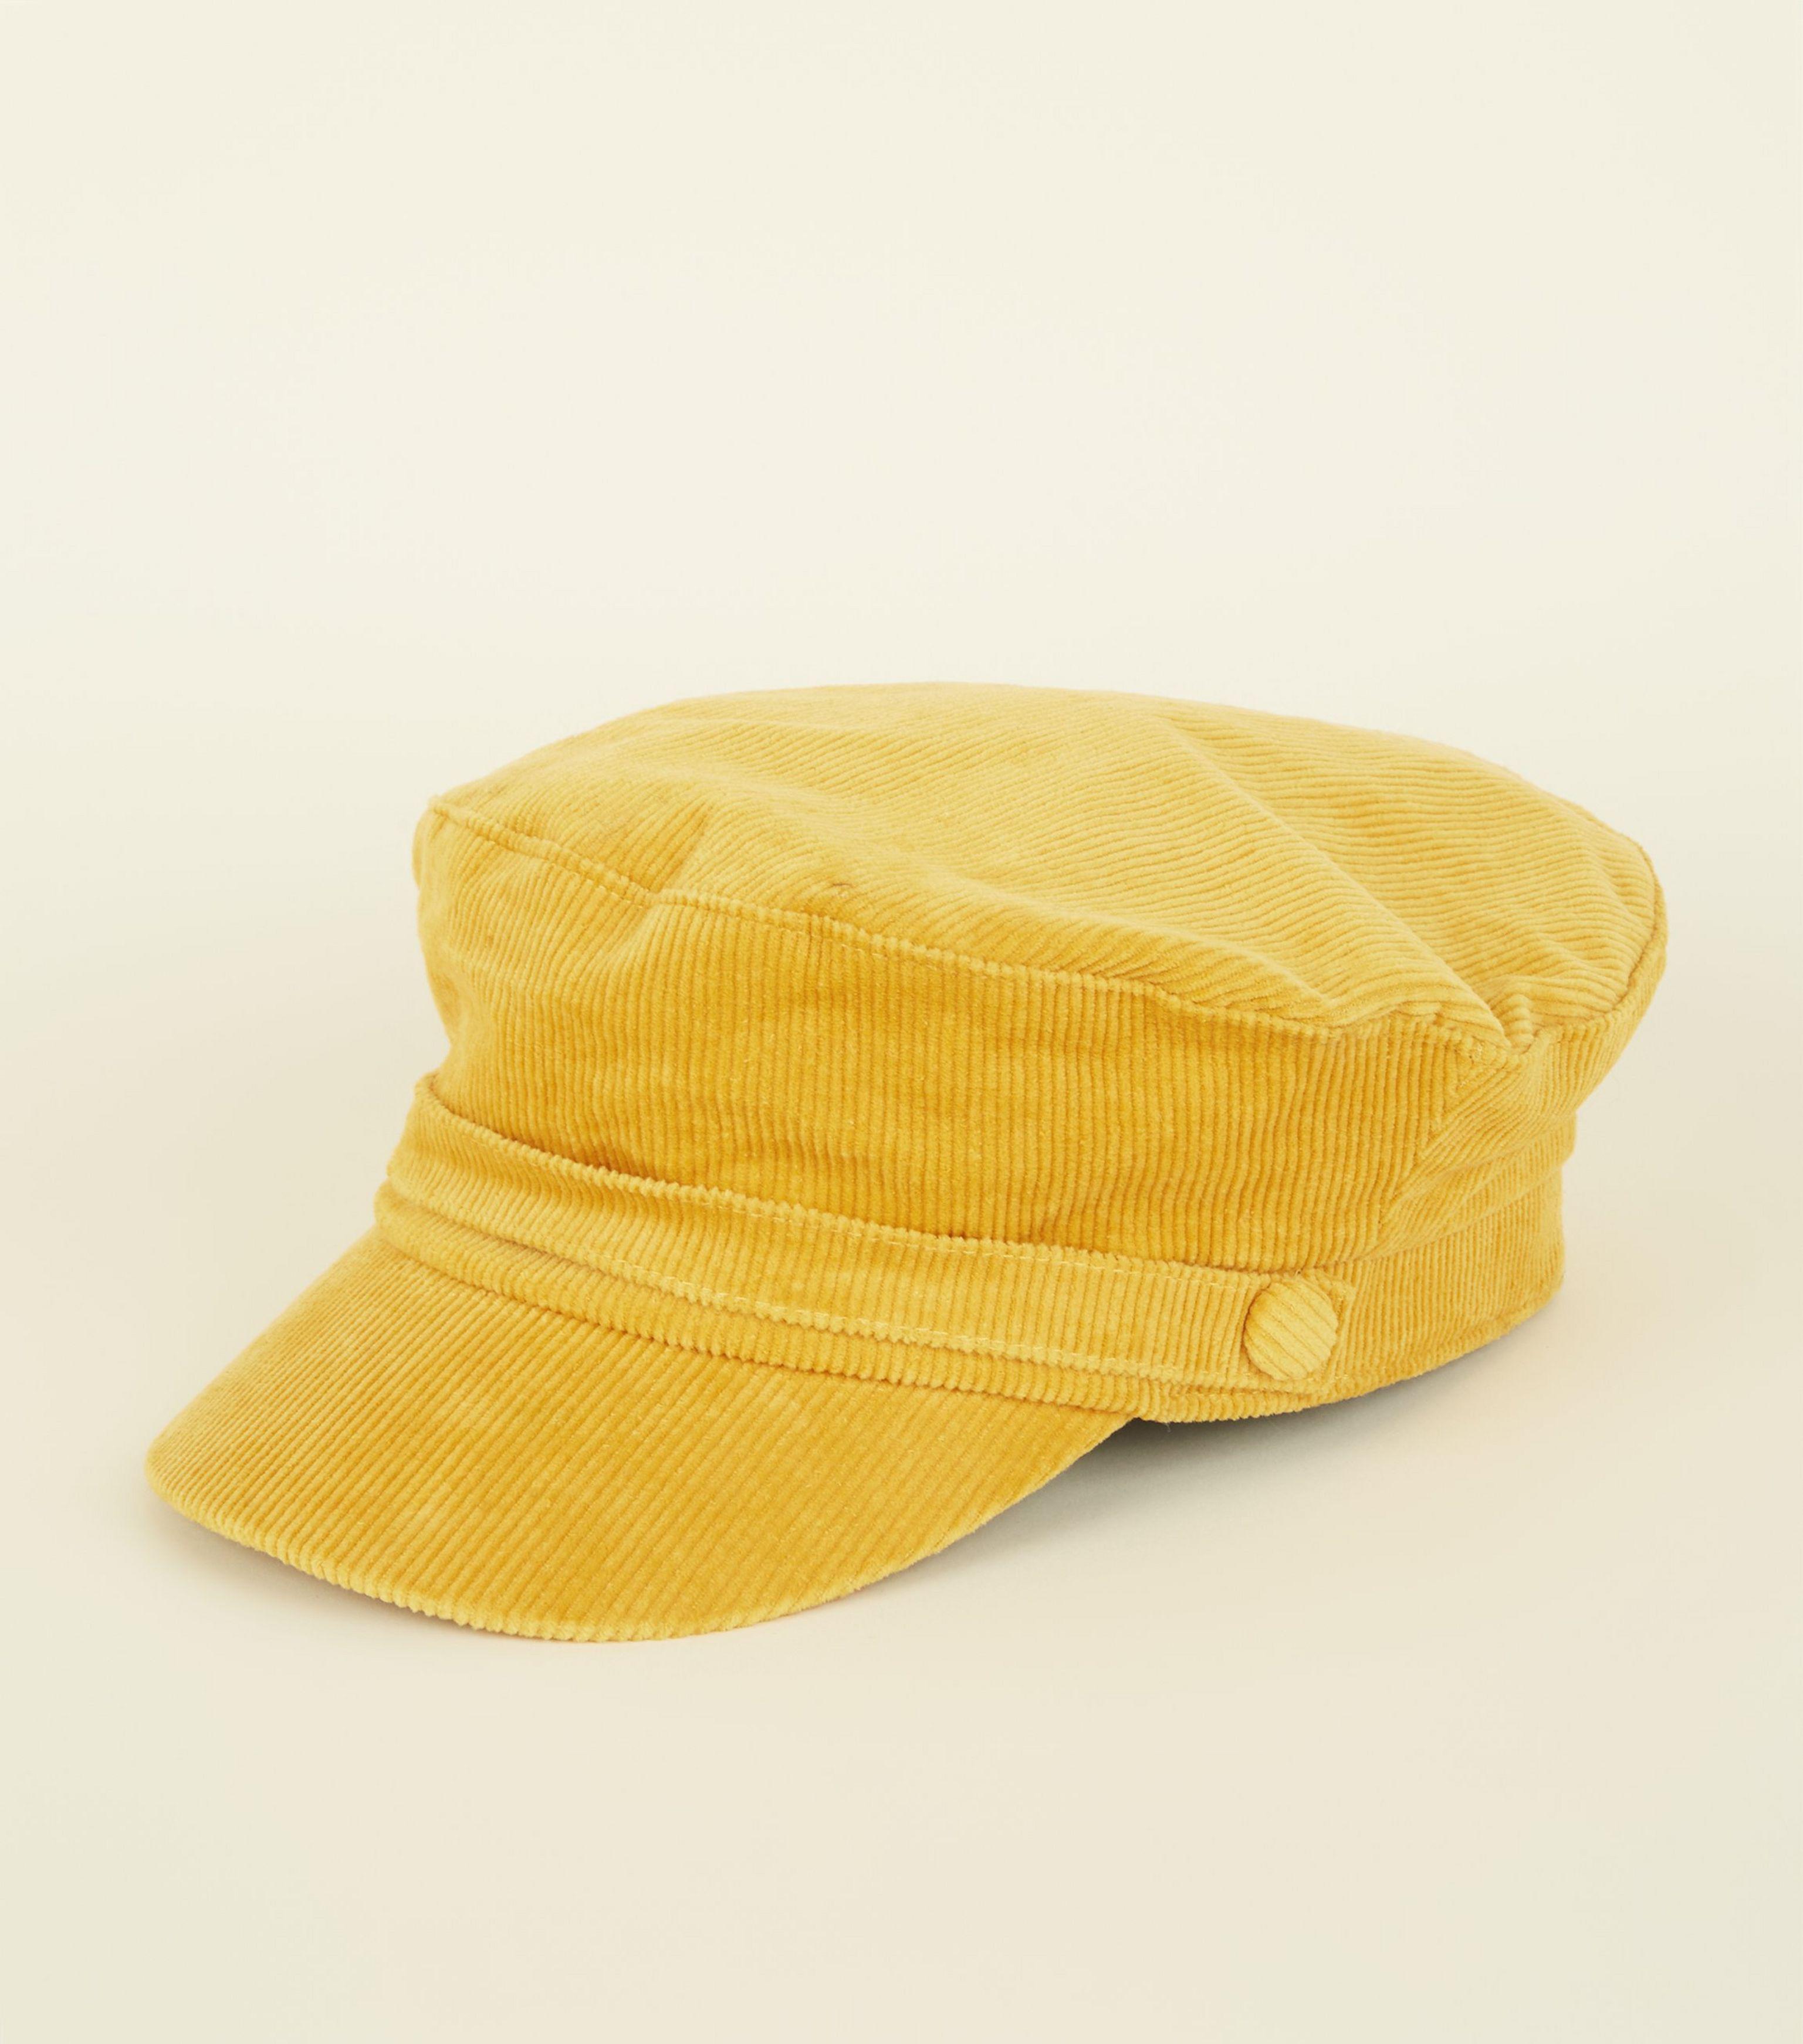 adeda76b1b626 New Look Mustard Corduroy Baker Boy Hat in Yellow - Lyst